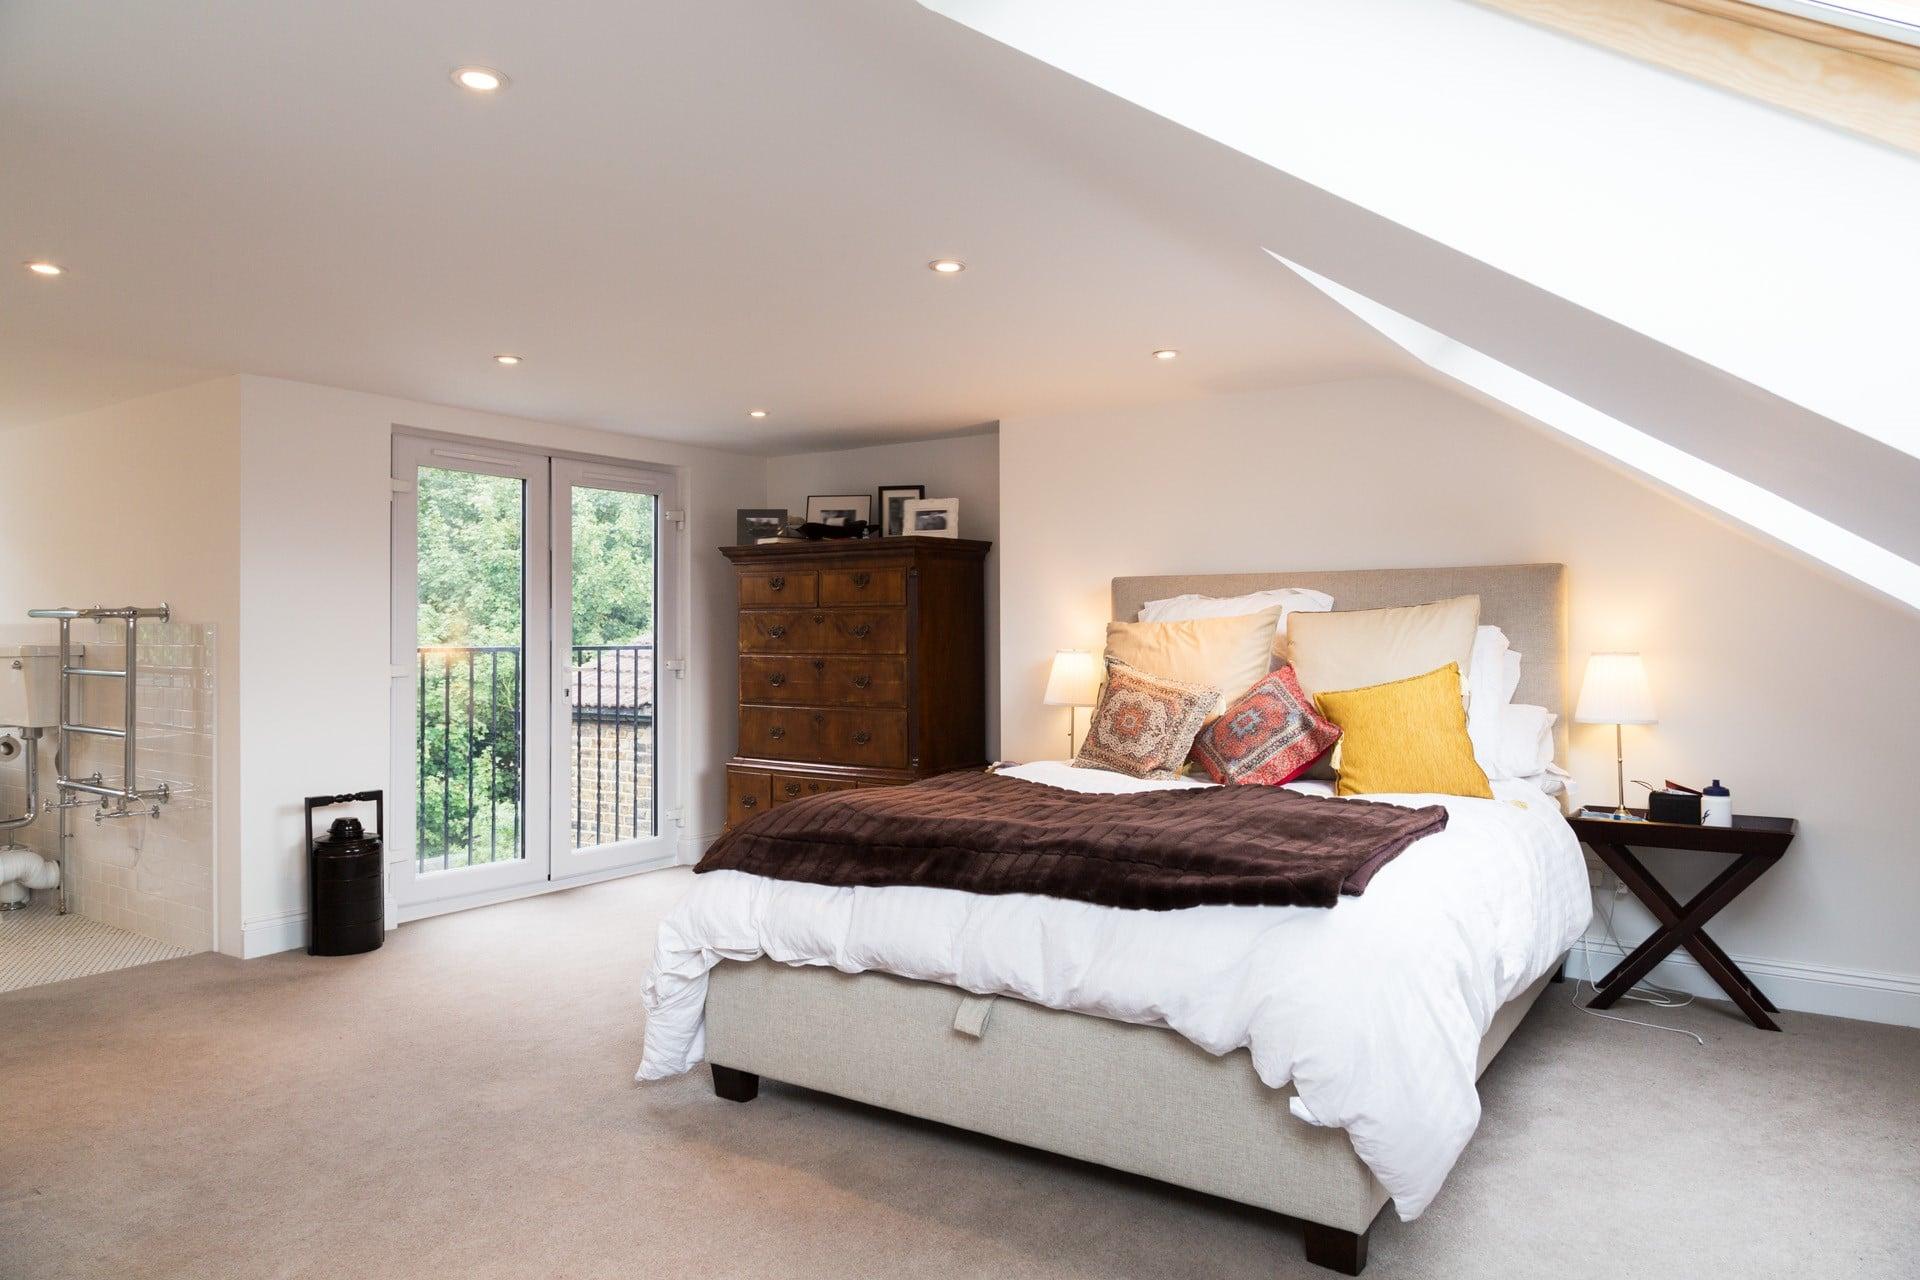 L shaped loft conversion multiple room loft conversion for Bedroom ideas uk